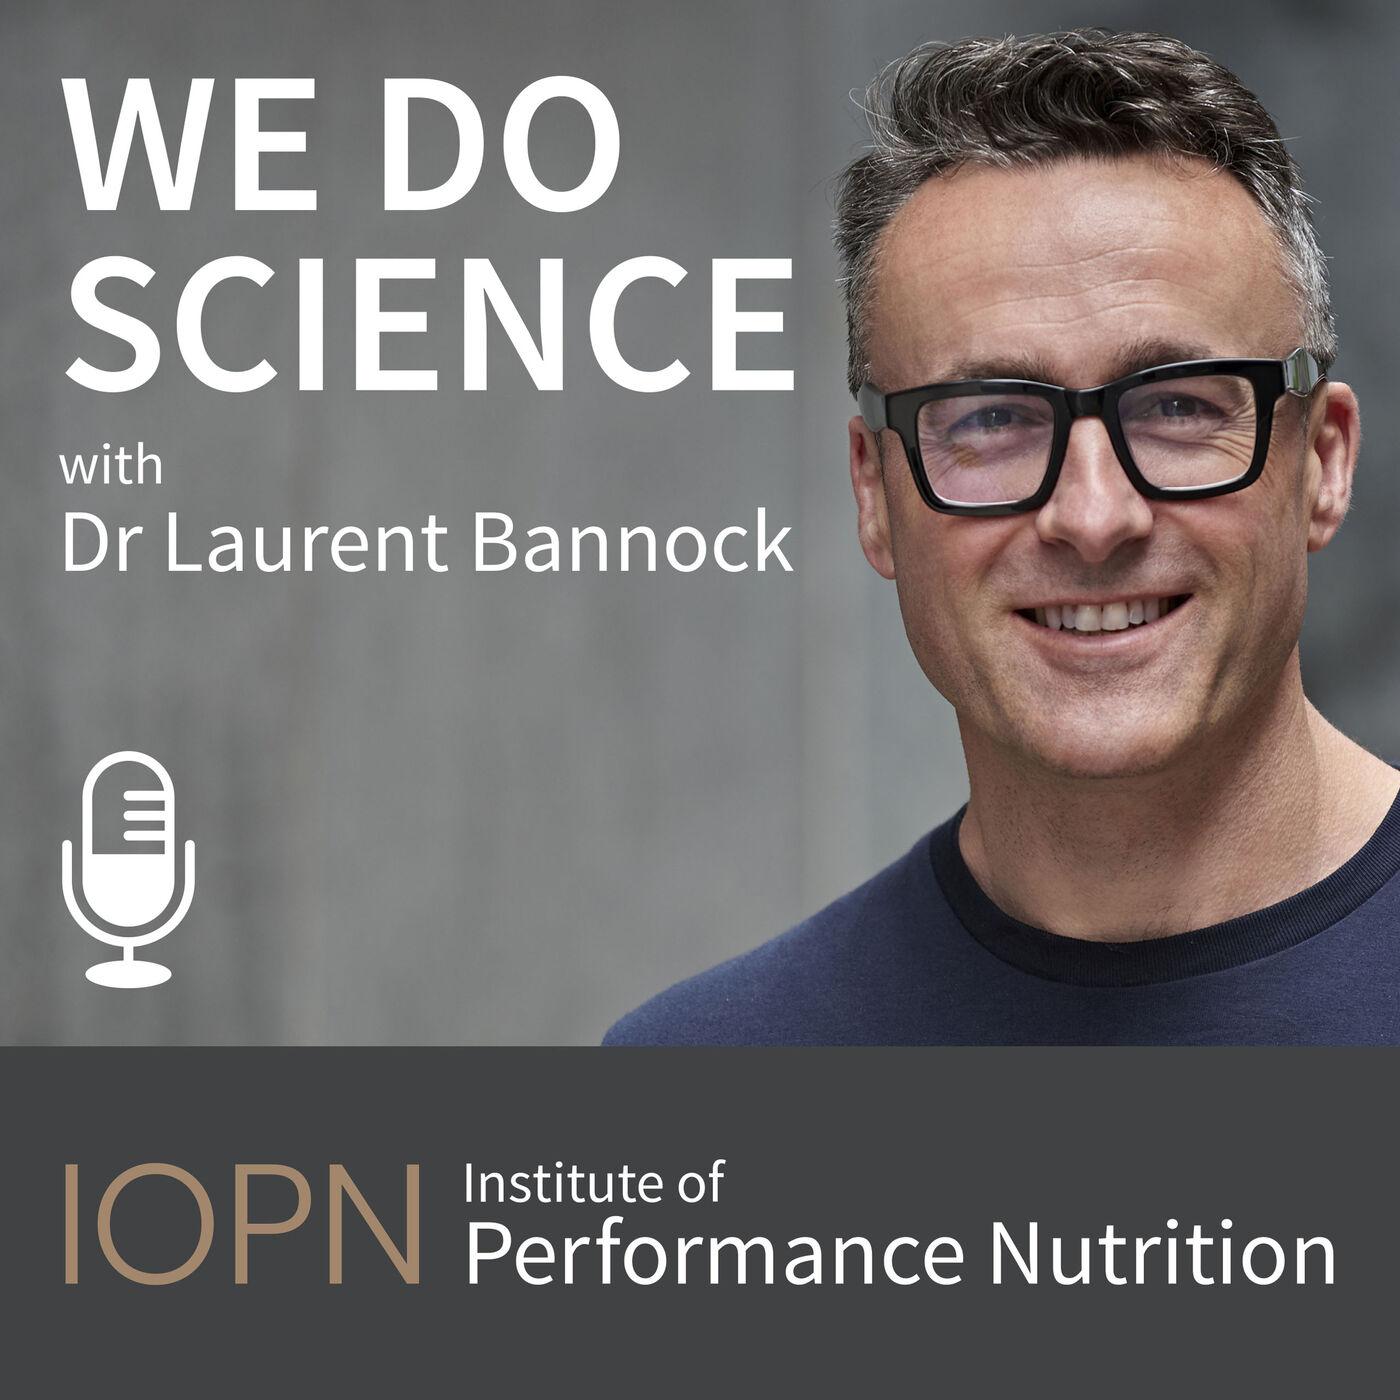 Episode 99 - 'Translational Sport Science' with Joe Eisenmann PhD